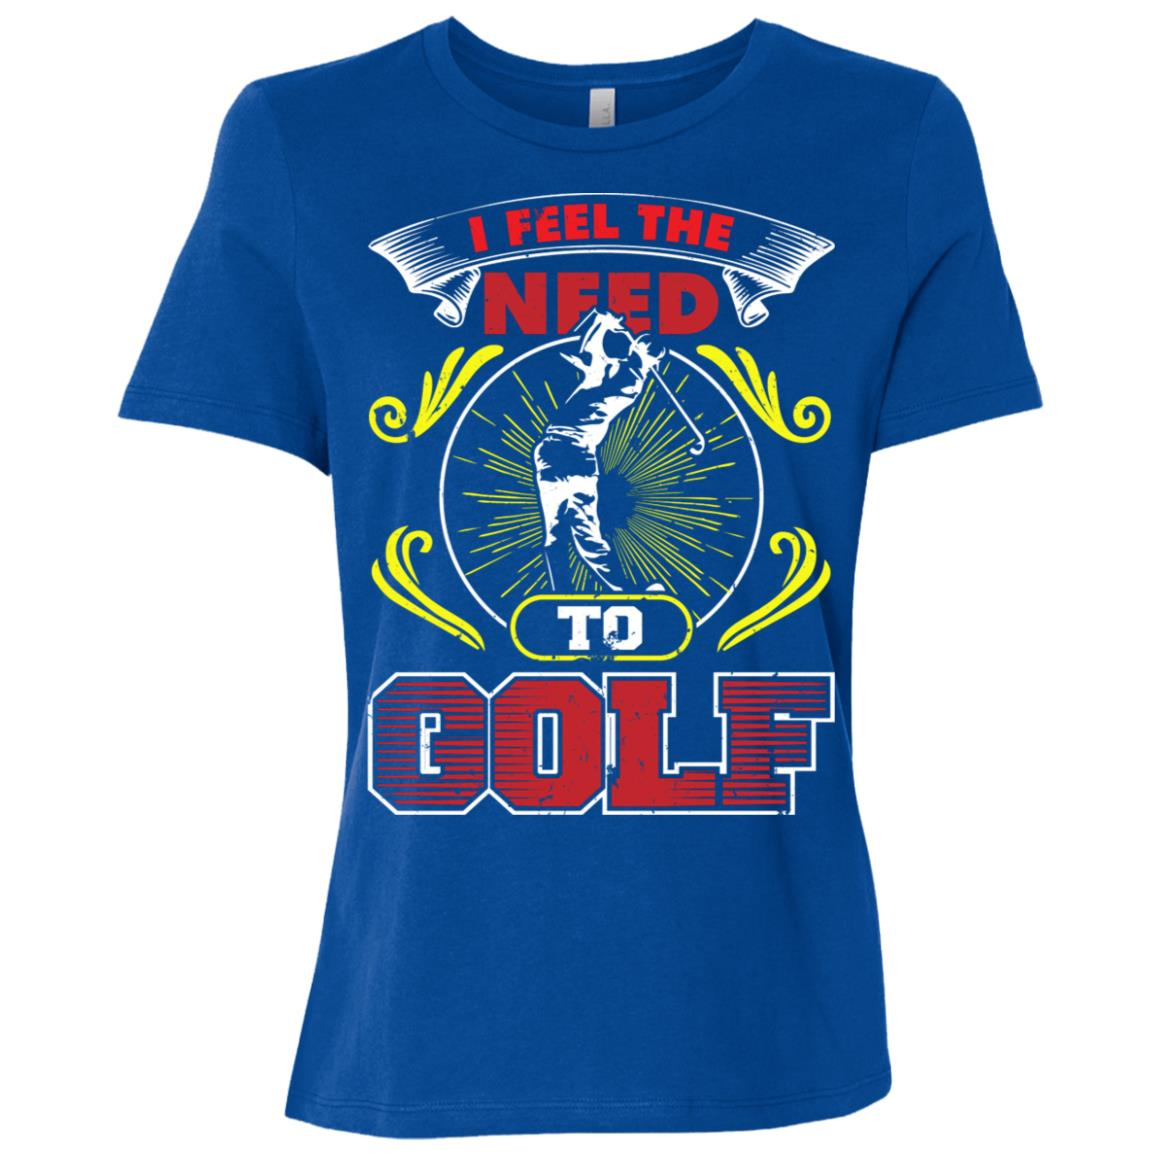 I Feel The Need To Golf Women Short Sleeve T-Shirt